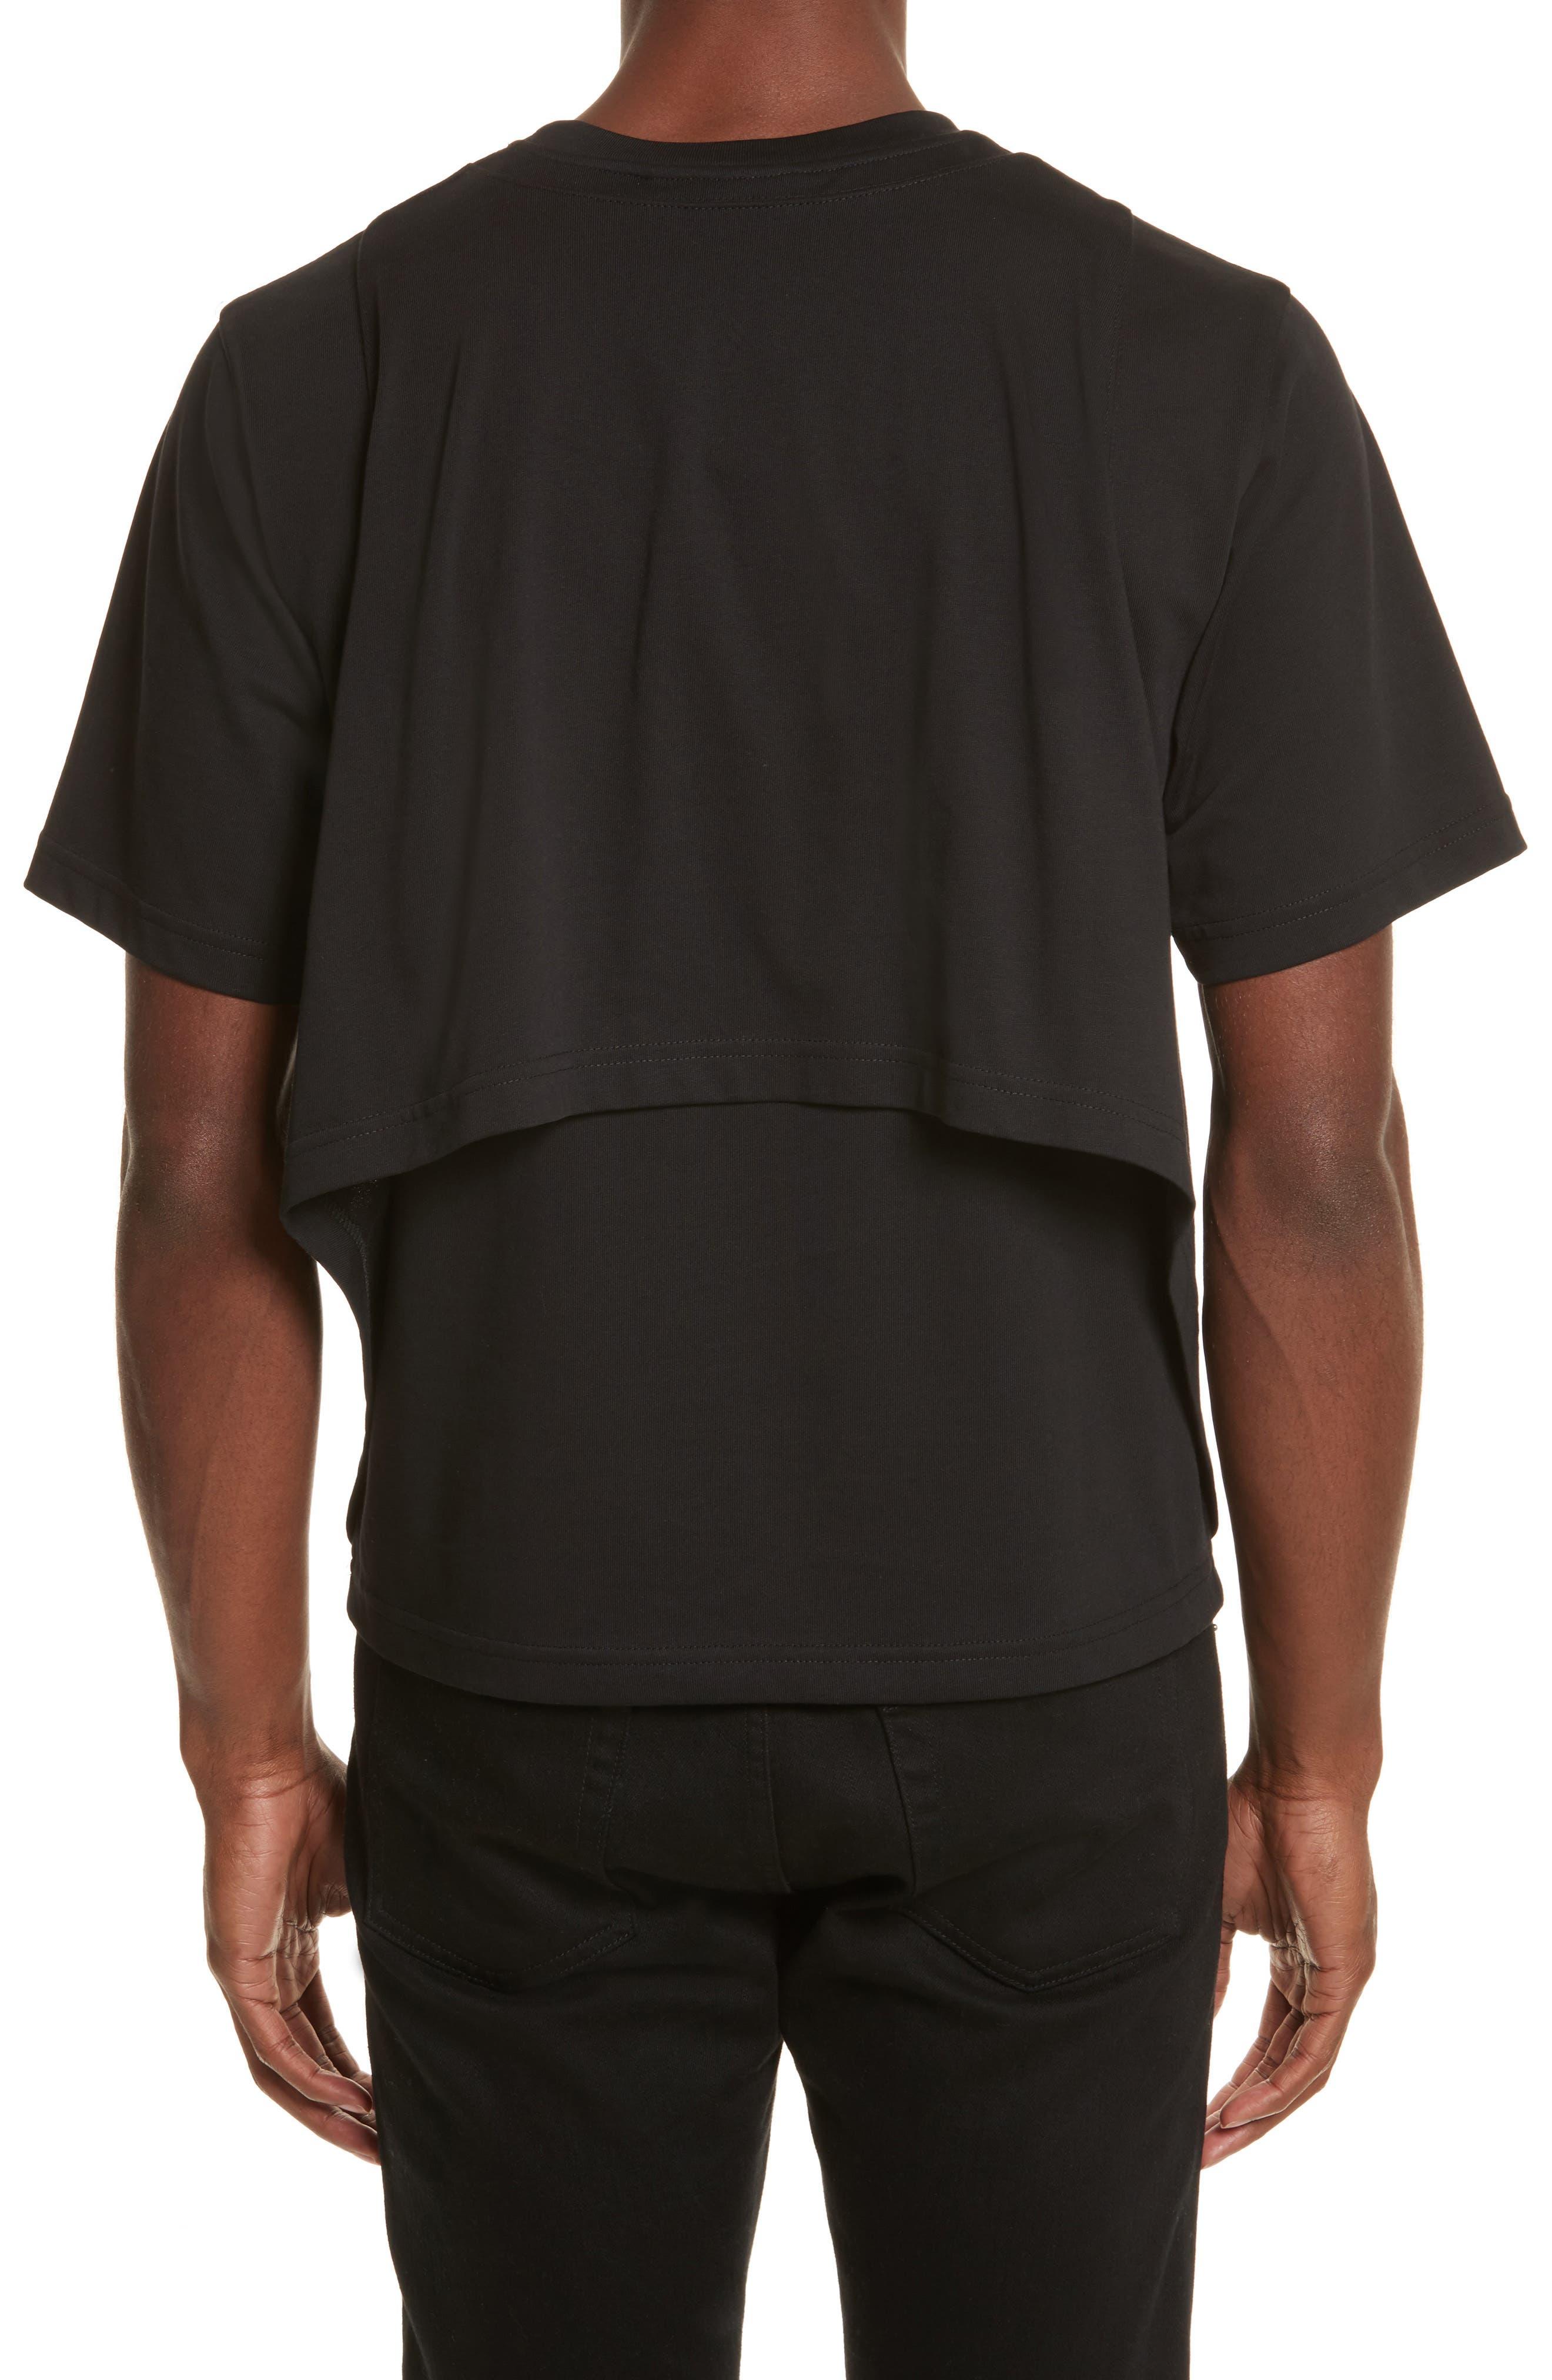 Alternate Image 2  - Helmut Lang Drape Military Jersey T-Shirt